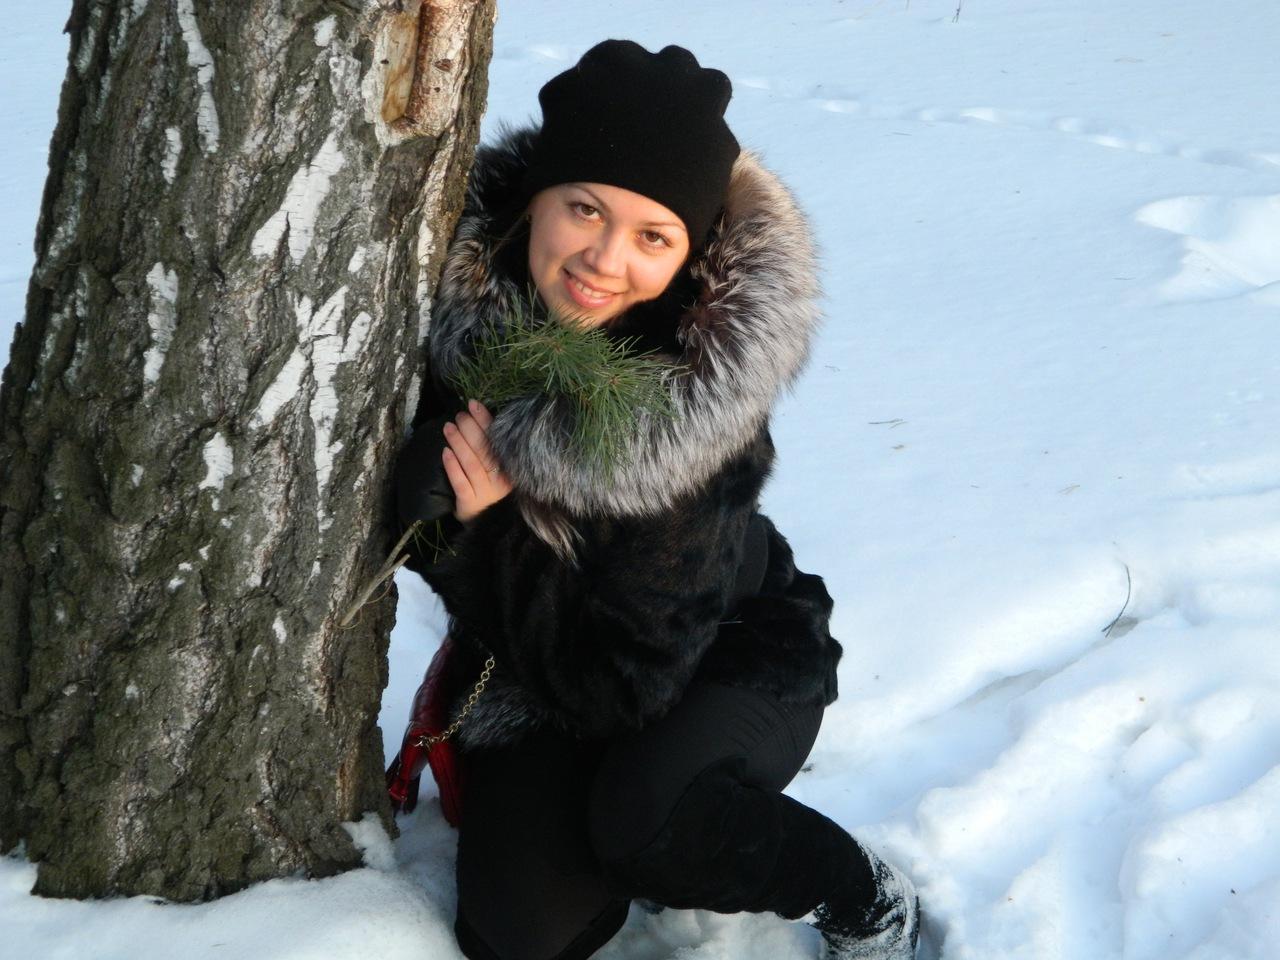 Анастасия Демьянова, Сарапул - фото №16